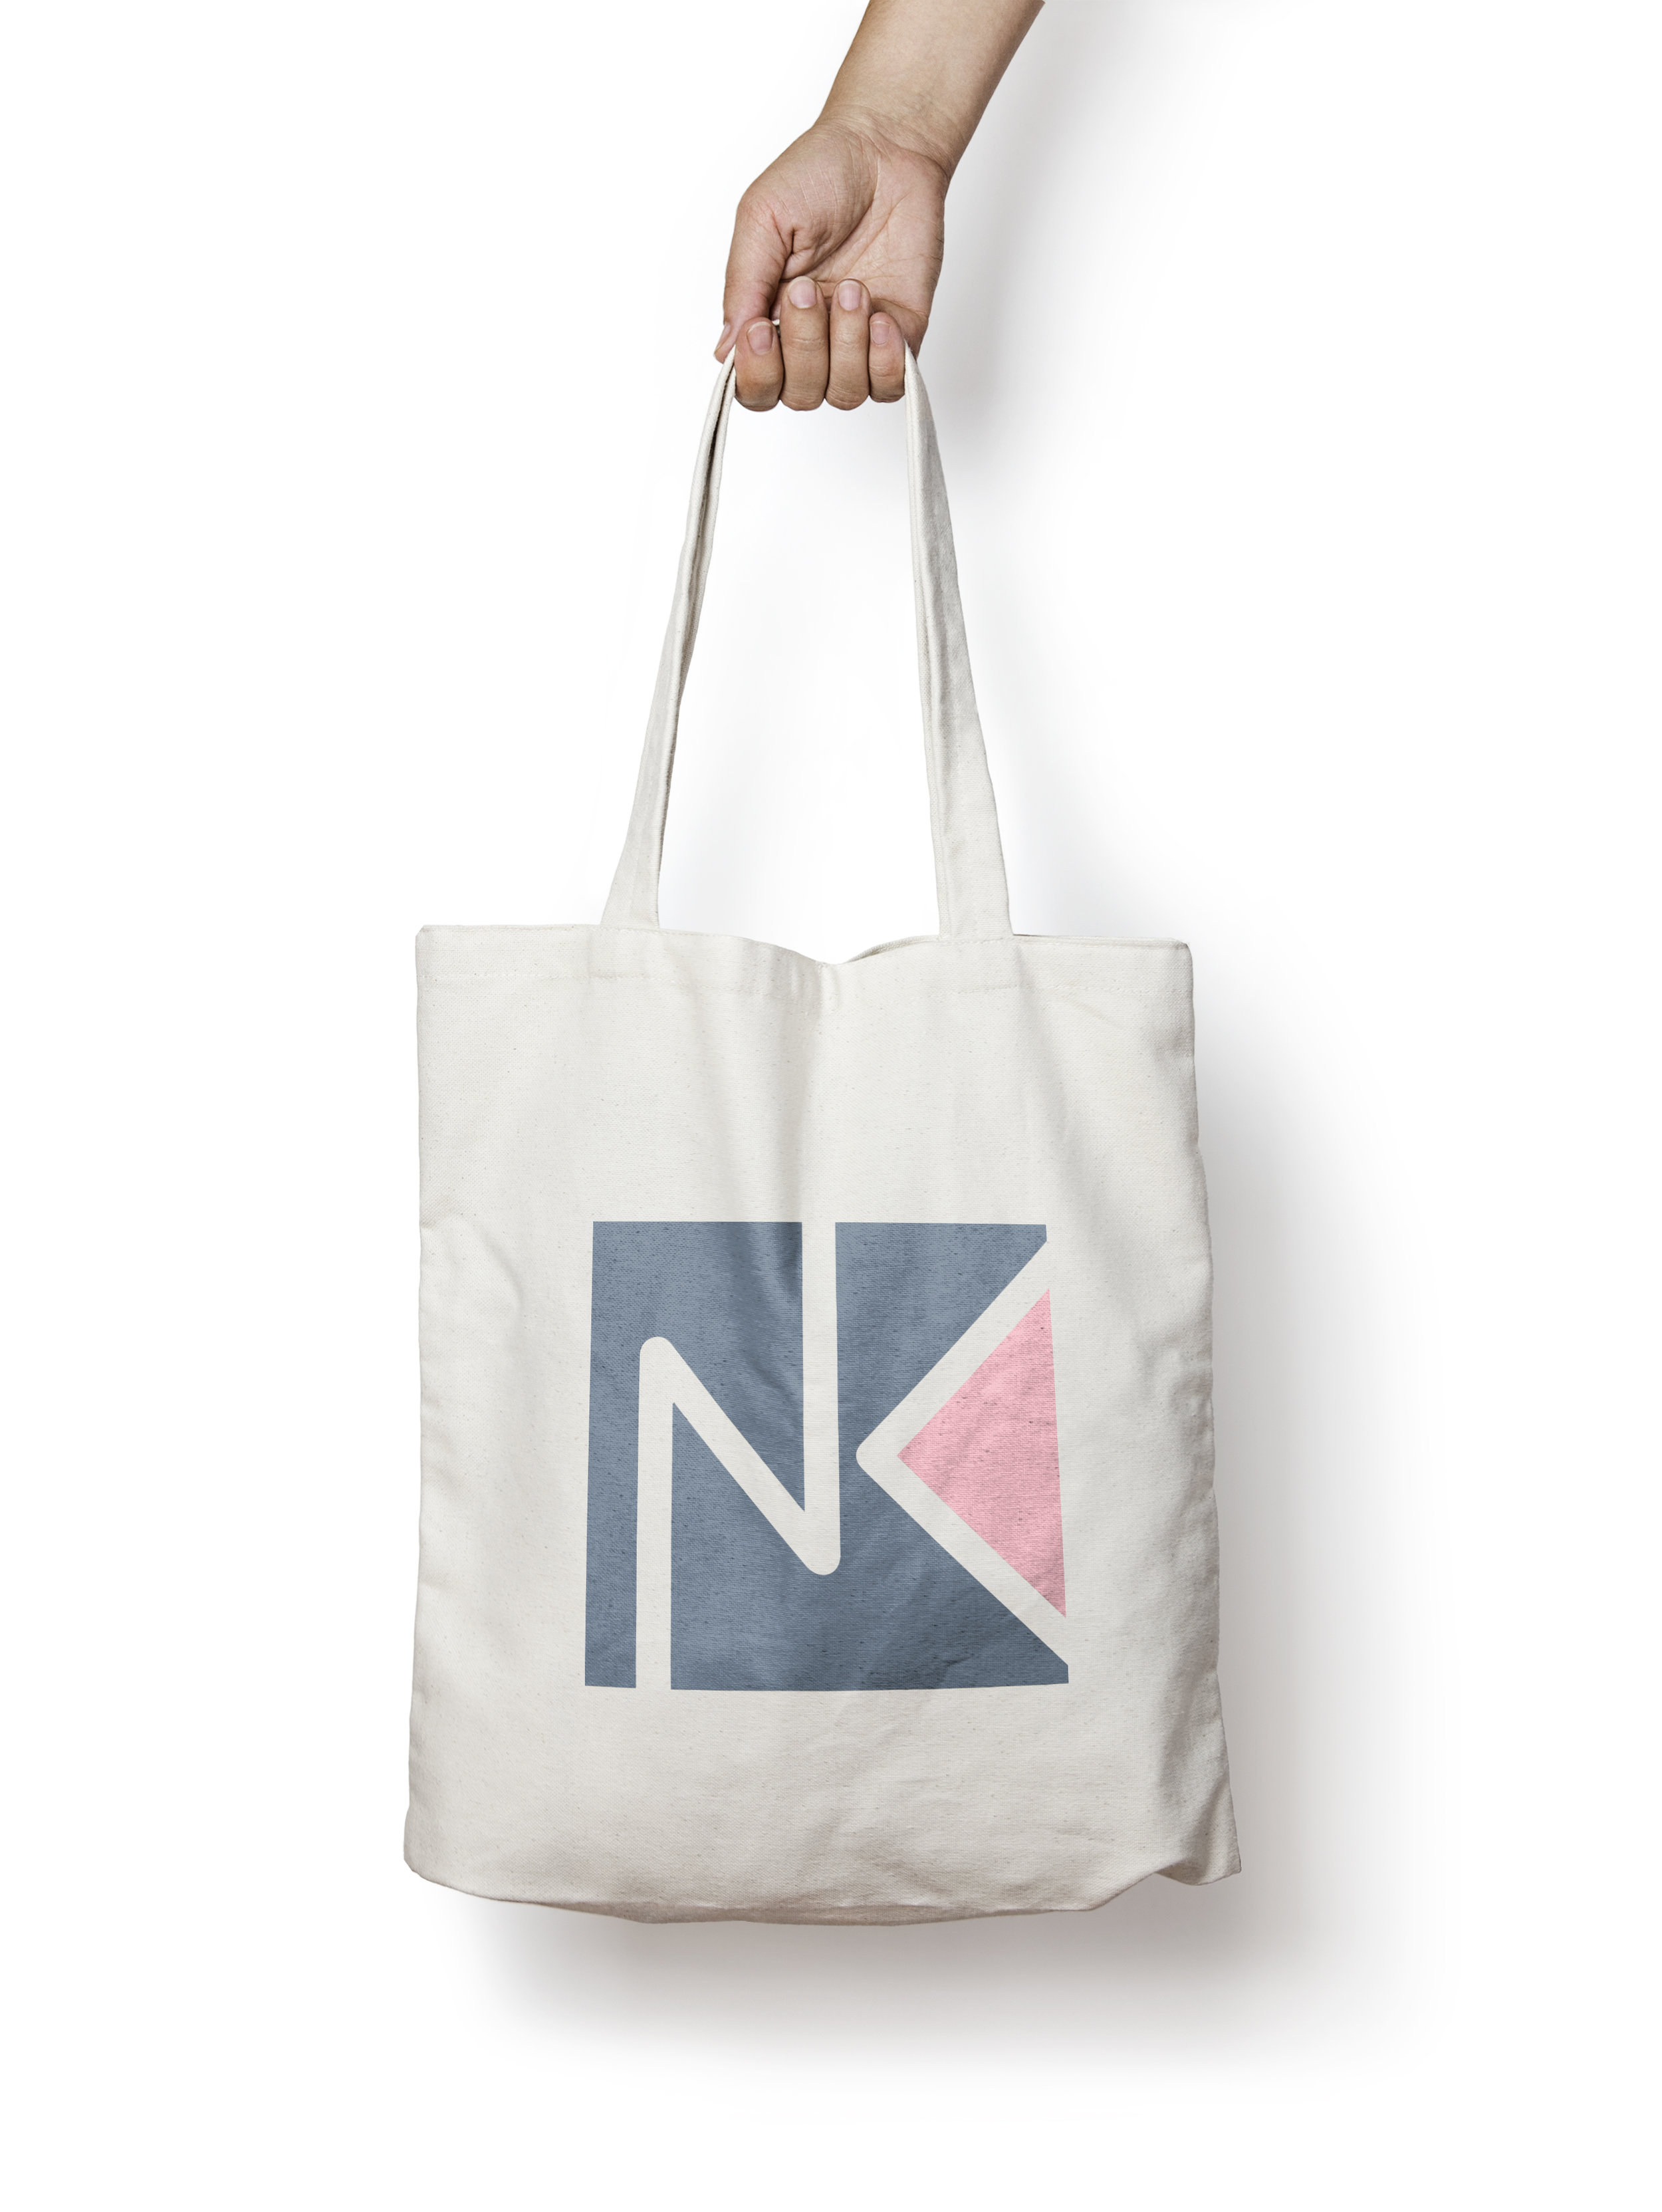 NewKen_Items_Tote_Concept2.jpg